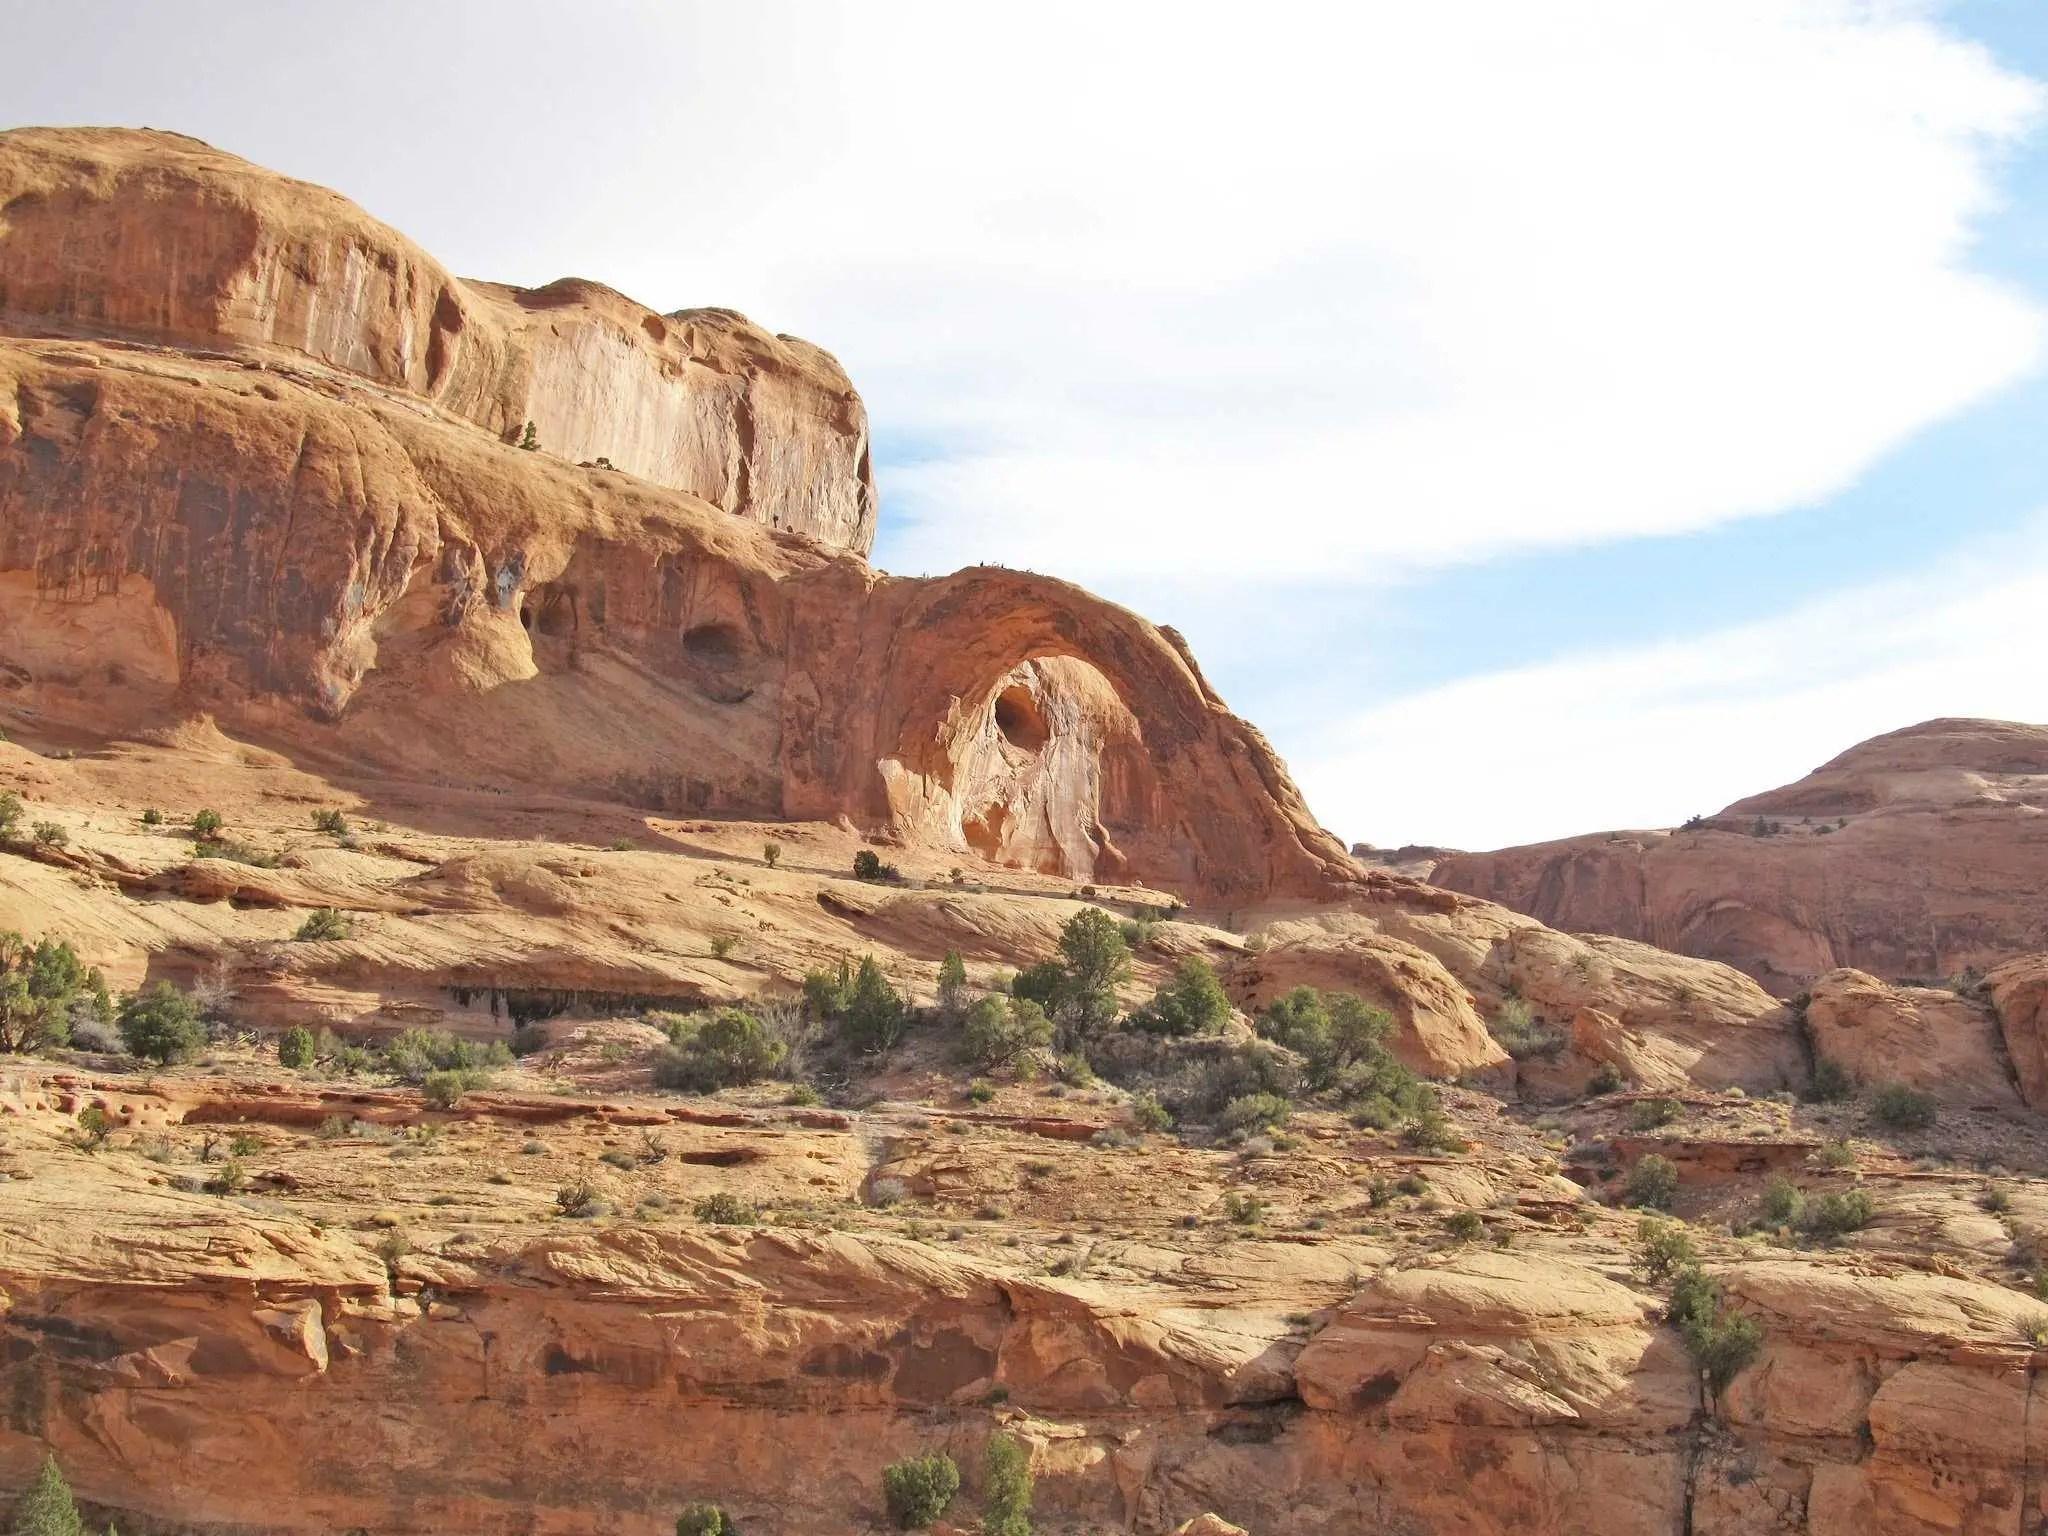 Mountain bike along the Poison Spider Mesa Trail in Moab, Utah.